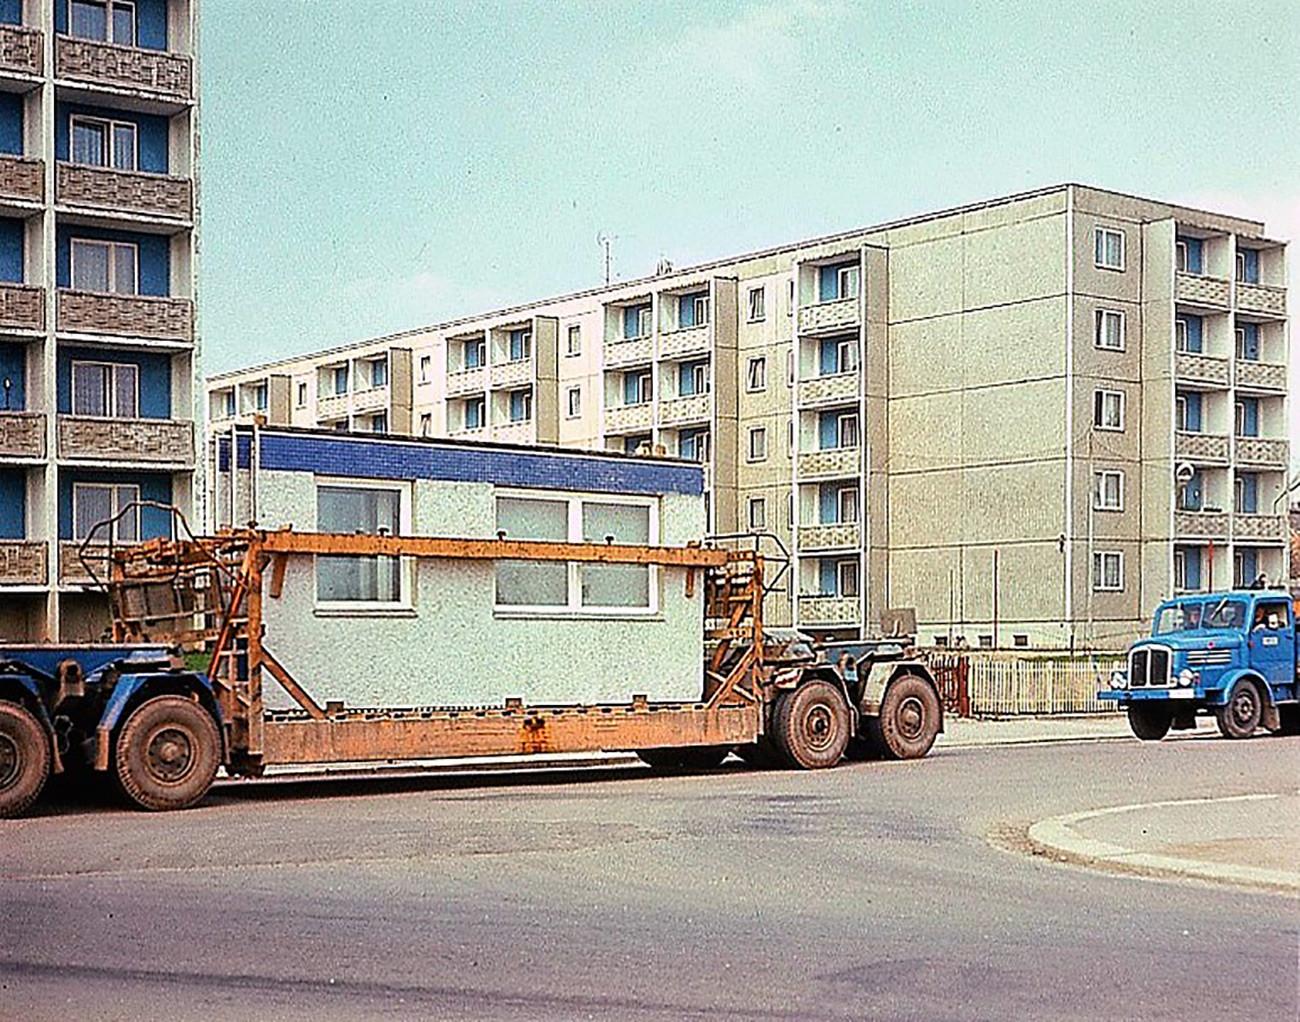 Montažni stanovanjski blok, t. i. hruščovka